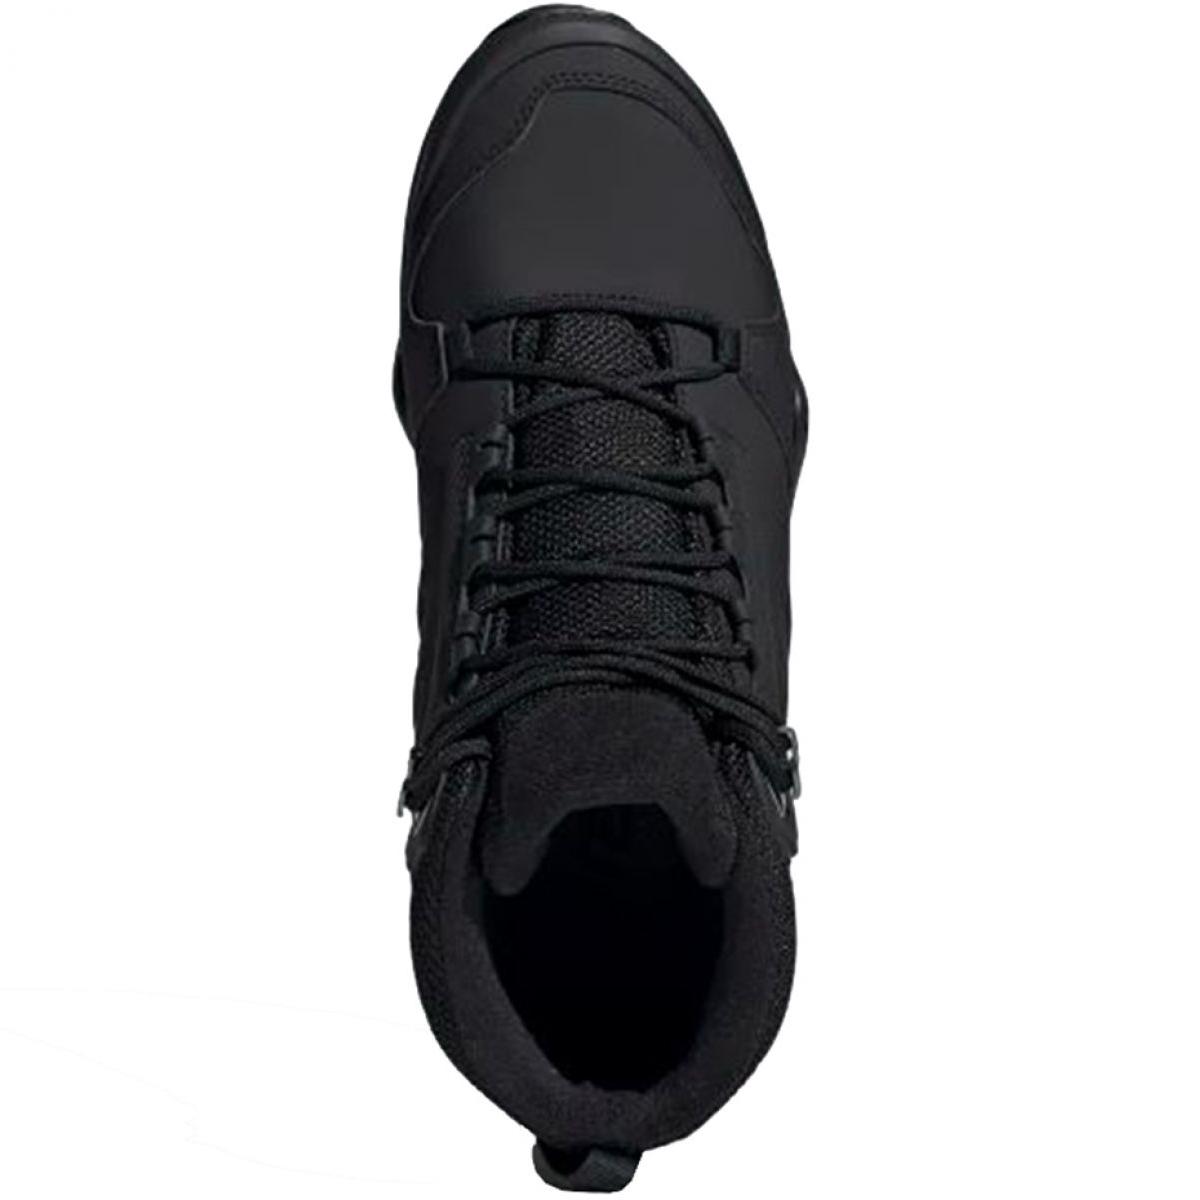 adidas Terrex AX3 Beta Mid G26524